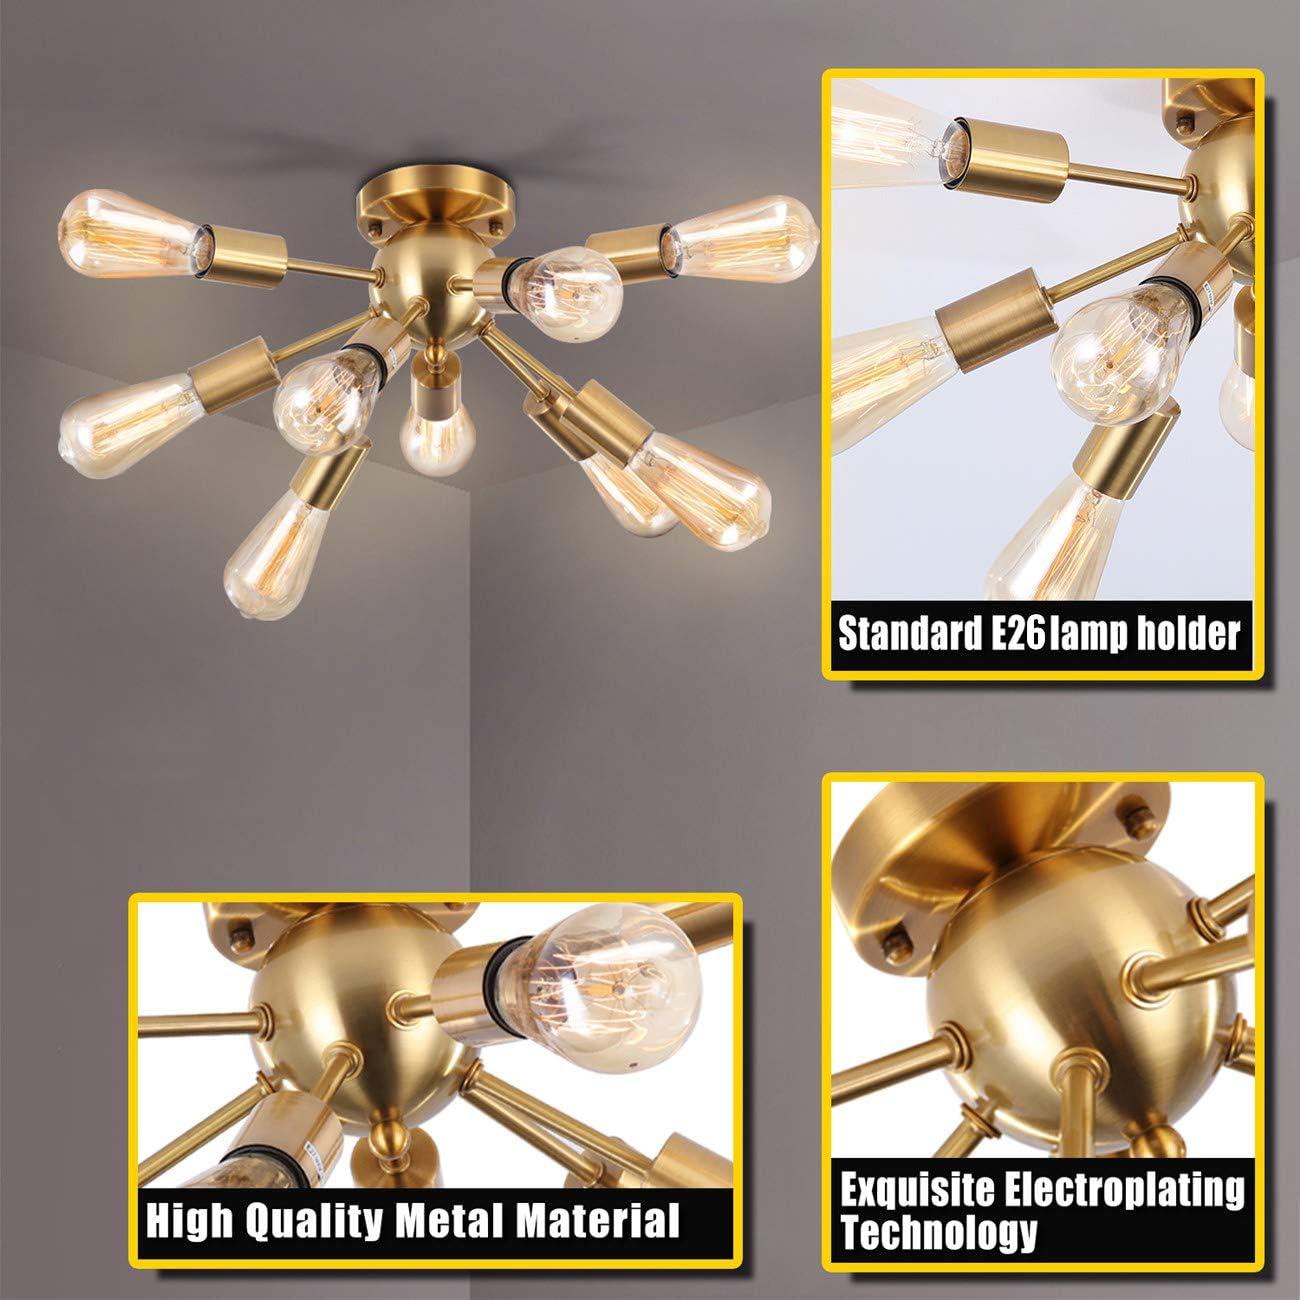 SUNVP Sputnik Ceiling Light Black Modern Gold Chandelier Pendent Light Fixture with 9 E26 Lamp Socket for Living Room Bedroom Kitchen Hallway Bar